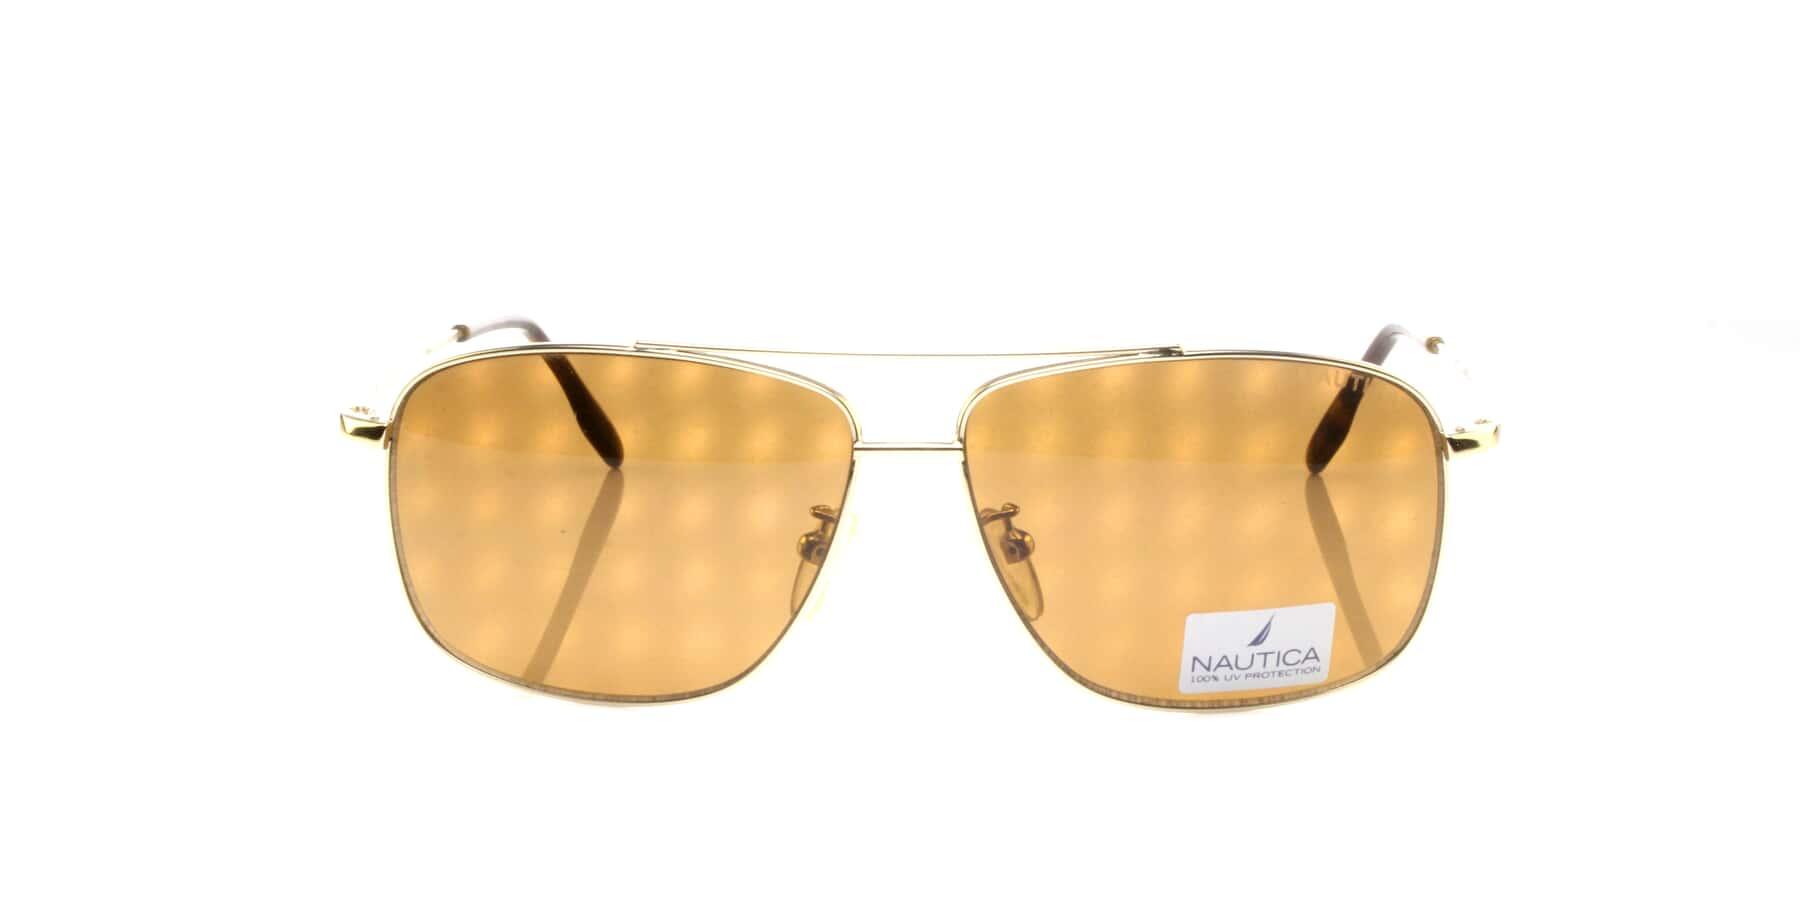 71d0e8ca10 Nautica N5027S RX 068 (59-12-140) Sunglasses